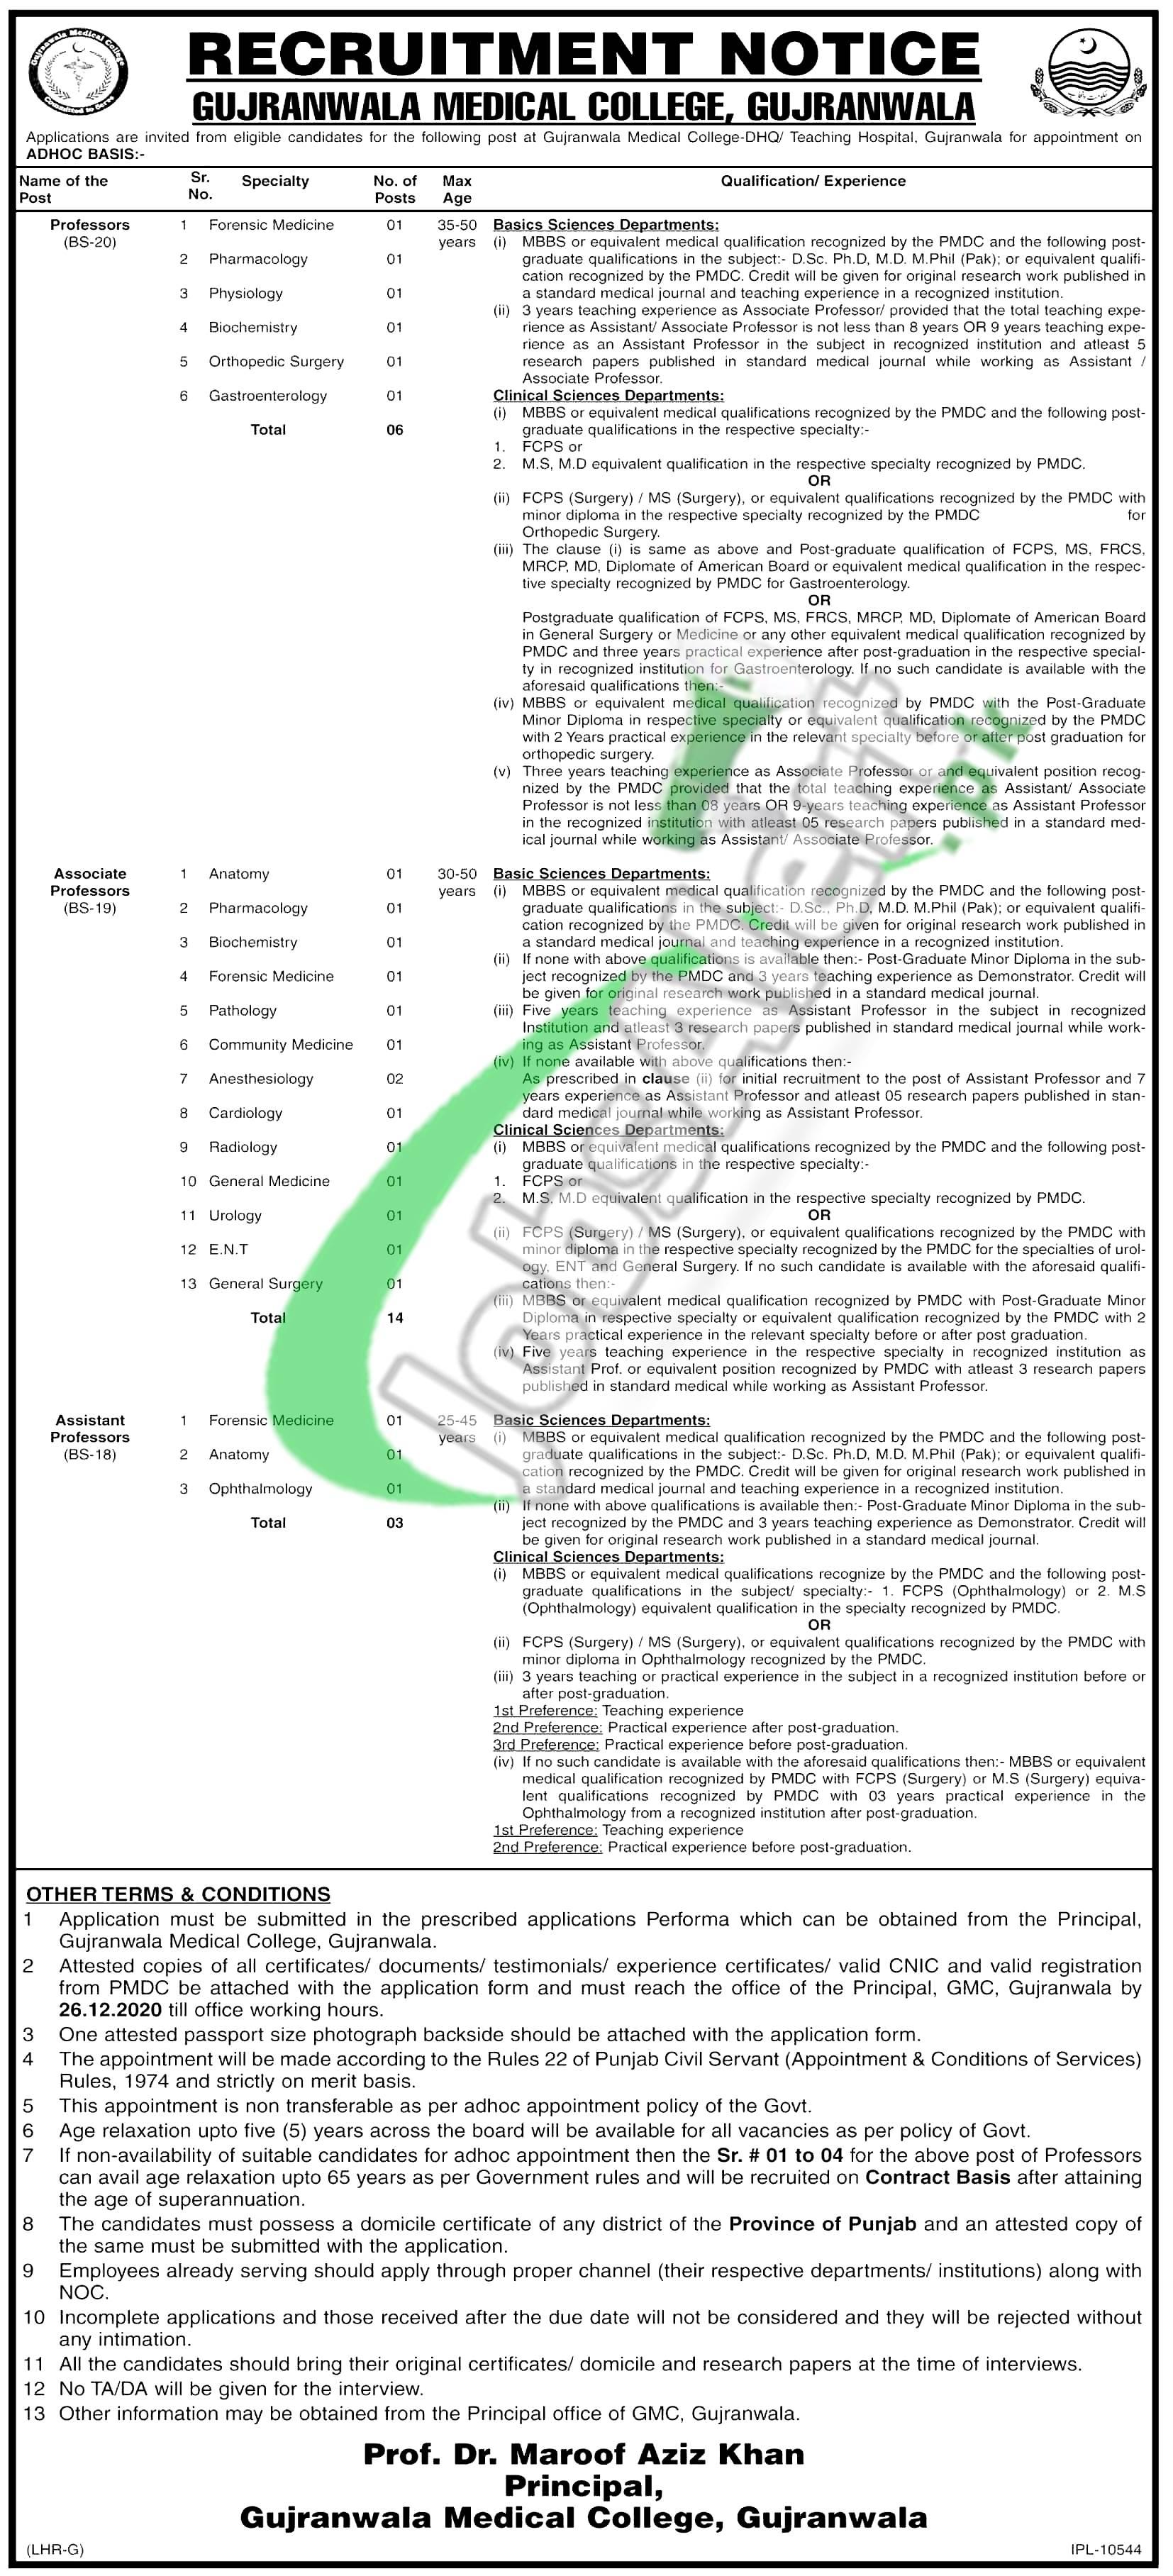 Gujranwala Medical College DHQ Jobs